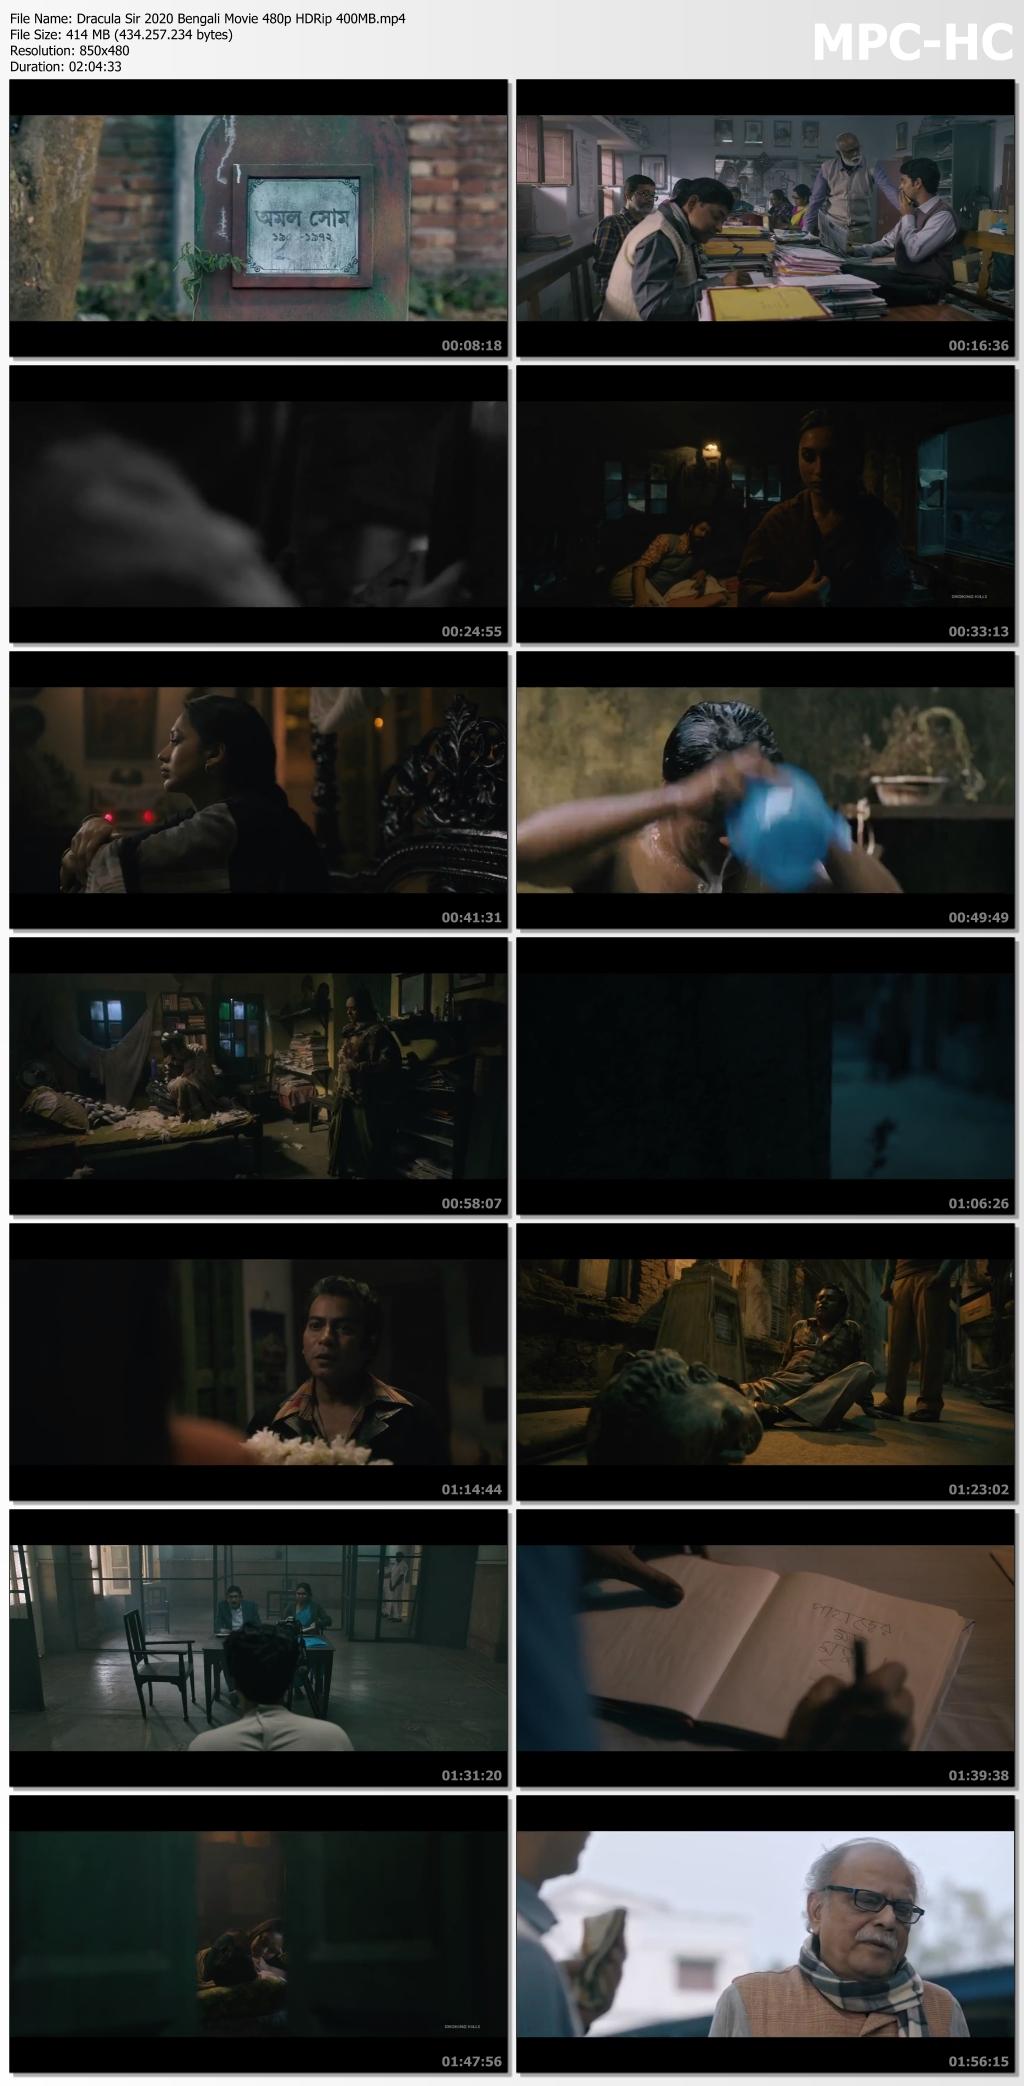 Dracula-Sir-2020-Bengali-Movie-480p-HDRip-400-MB-mp4-thumbs